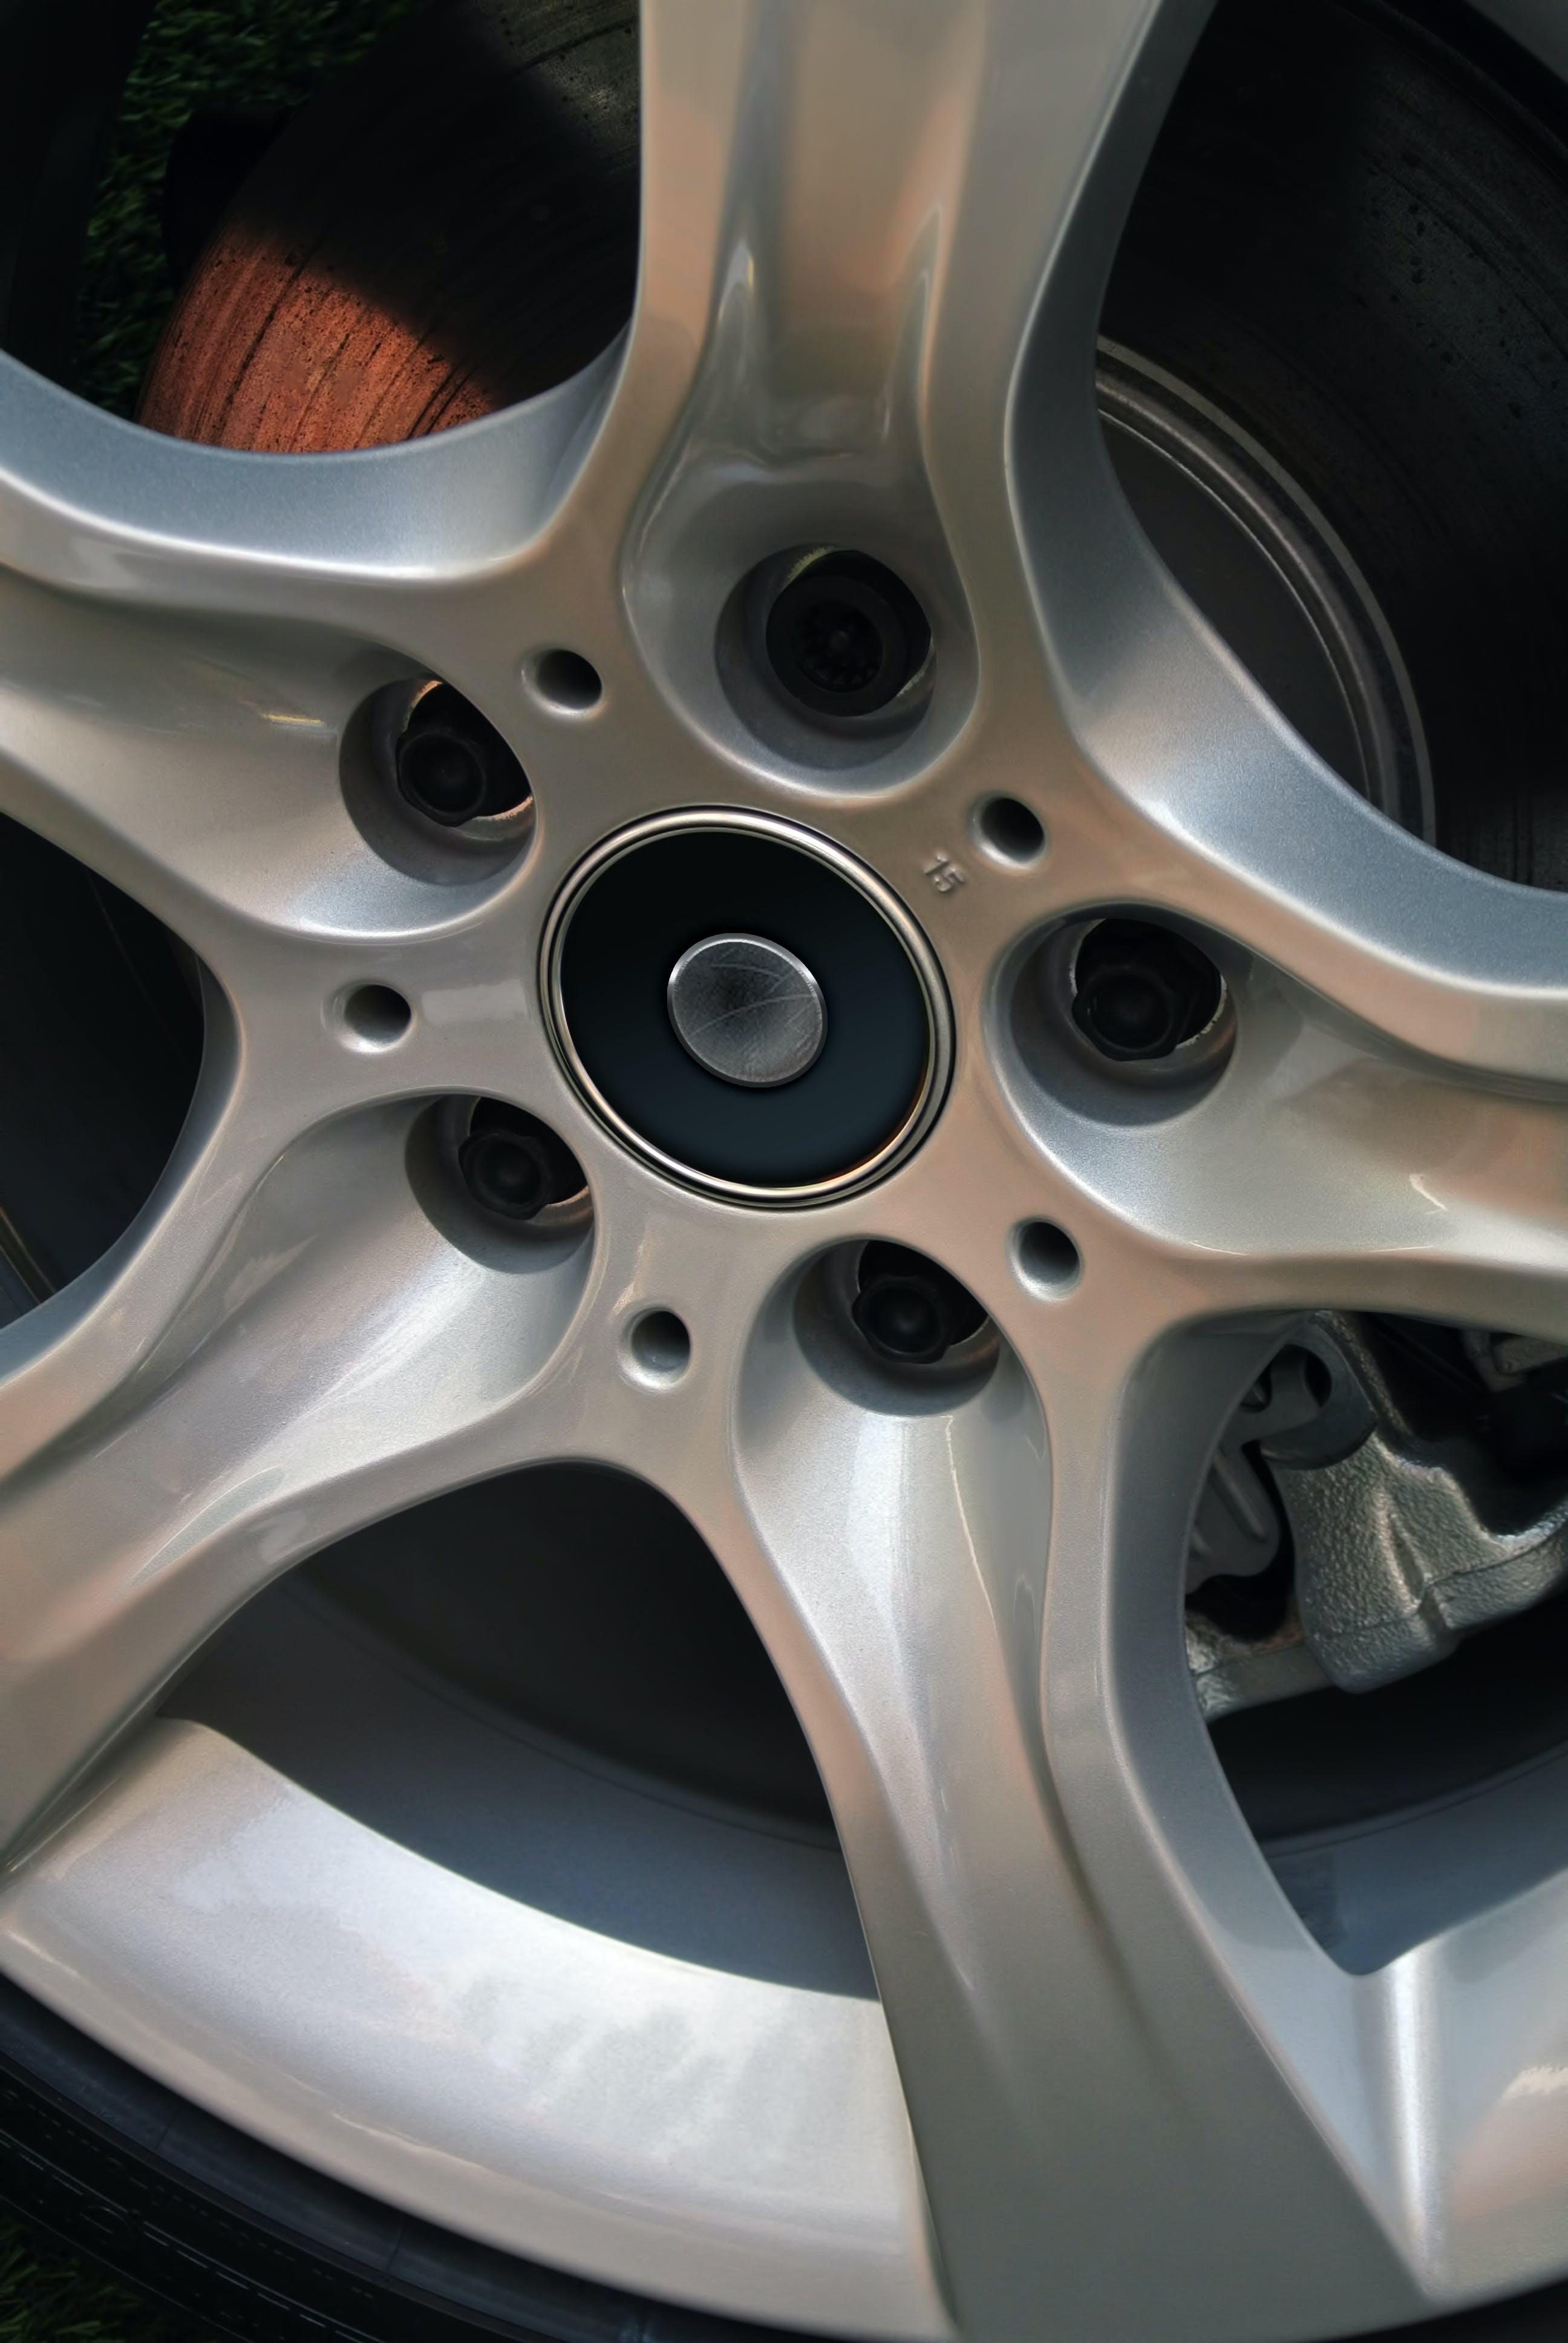 Free stock photo of 15, 15 inch wheel, alquiler de autos, automobile